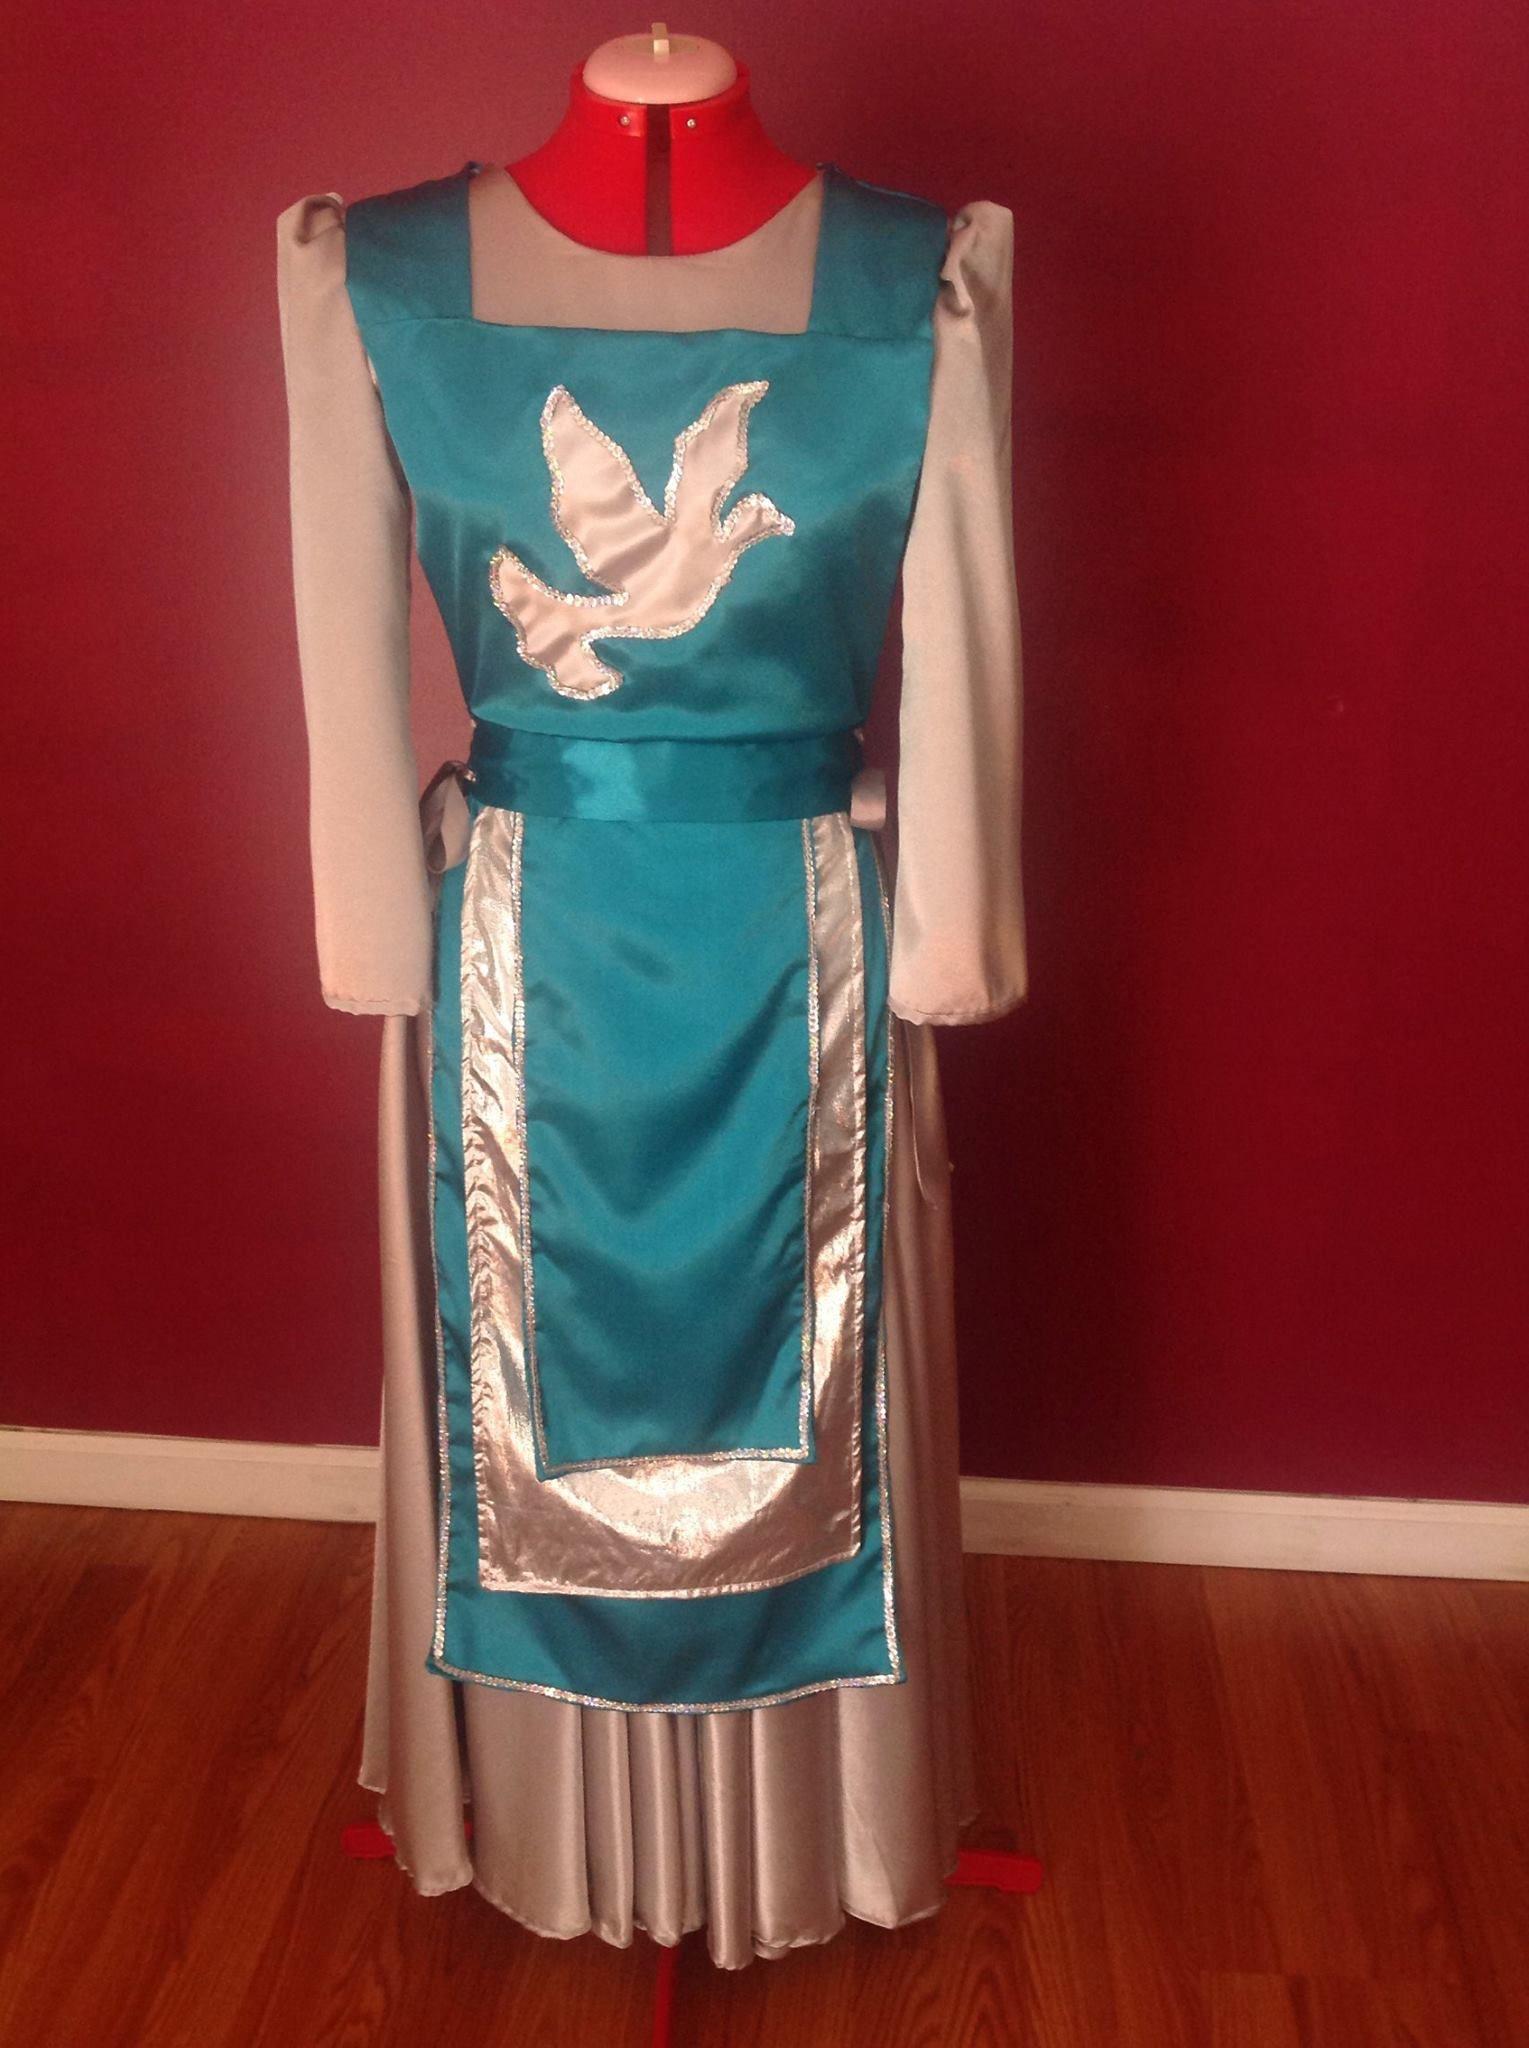 Disenos Por Genesis Creaciones Visitenos En Nuestra Pagina Web Www Macholahdanza Praise Dance Wear Praise Dance Garments Dance Outfits